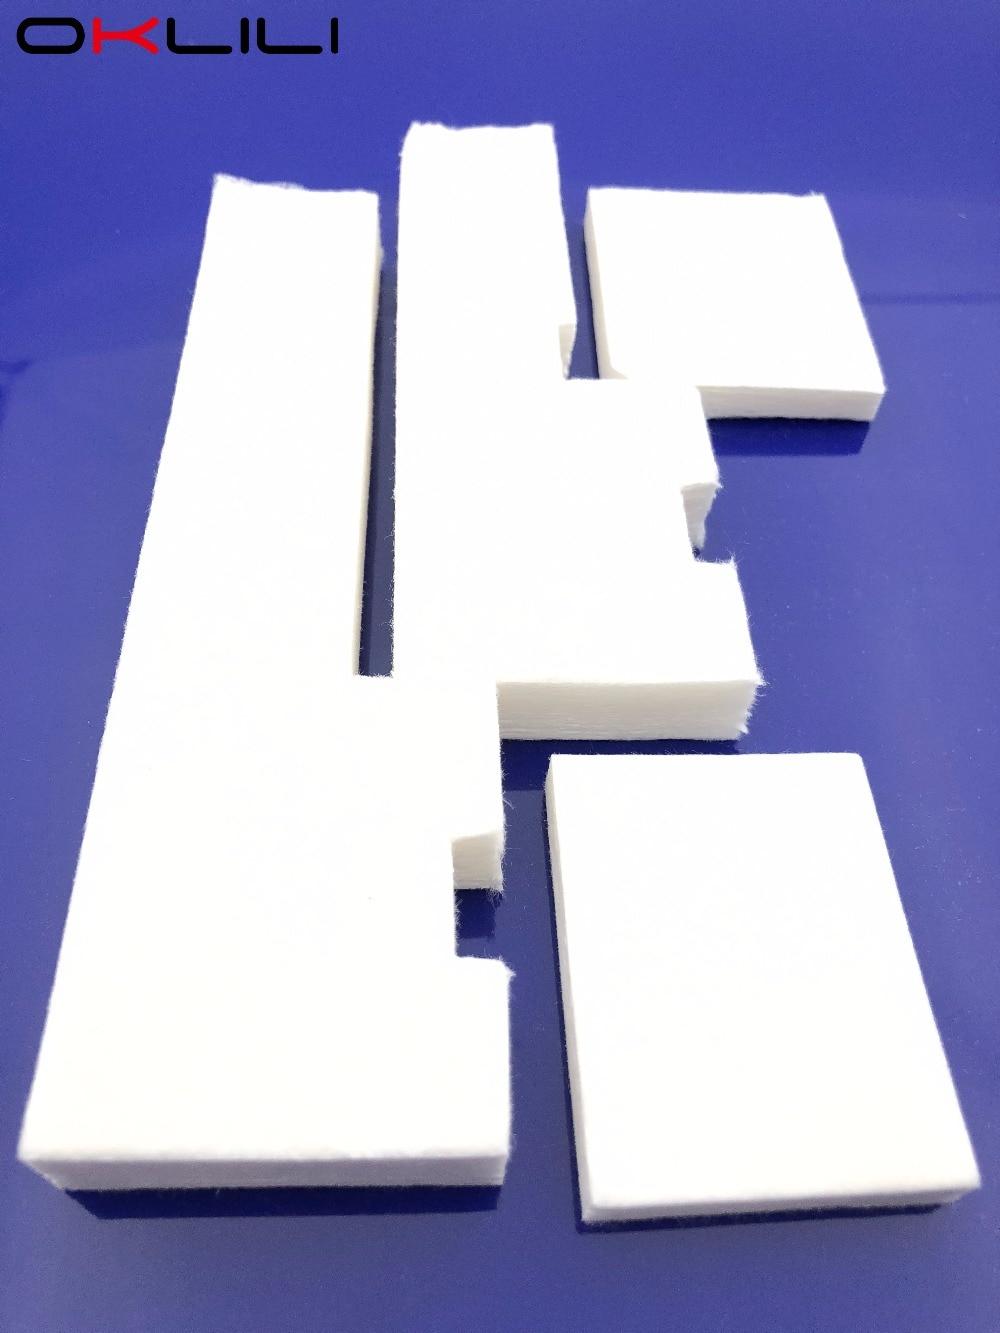 Printer Parts Original New Waste Ink Tank Pad Sponge For Epson R280 R290 P50 P60 T50 T60 A50 Tx650 R285 L800 L801 R330 L805 Easy To Repair Printer Supplies